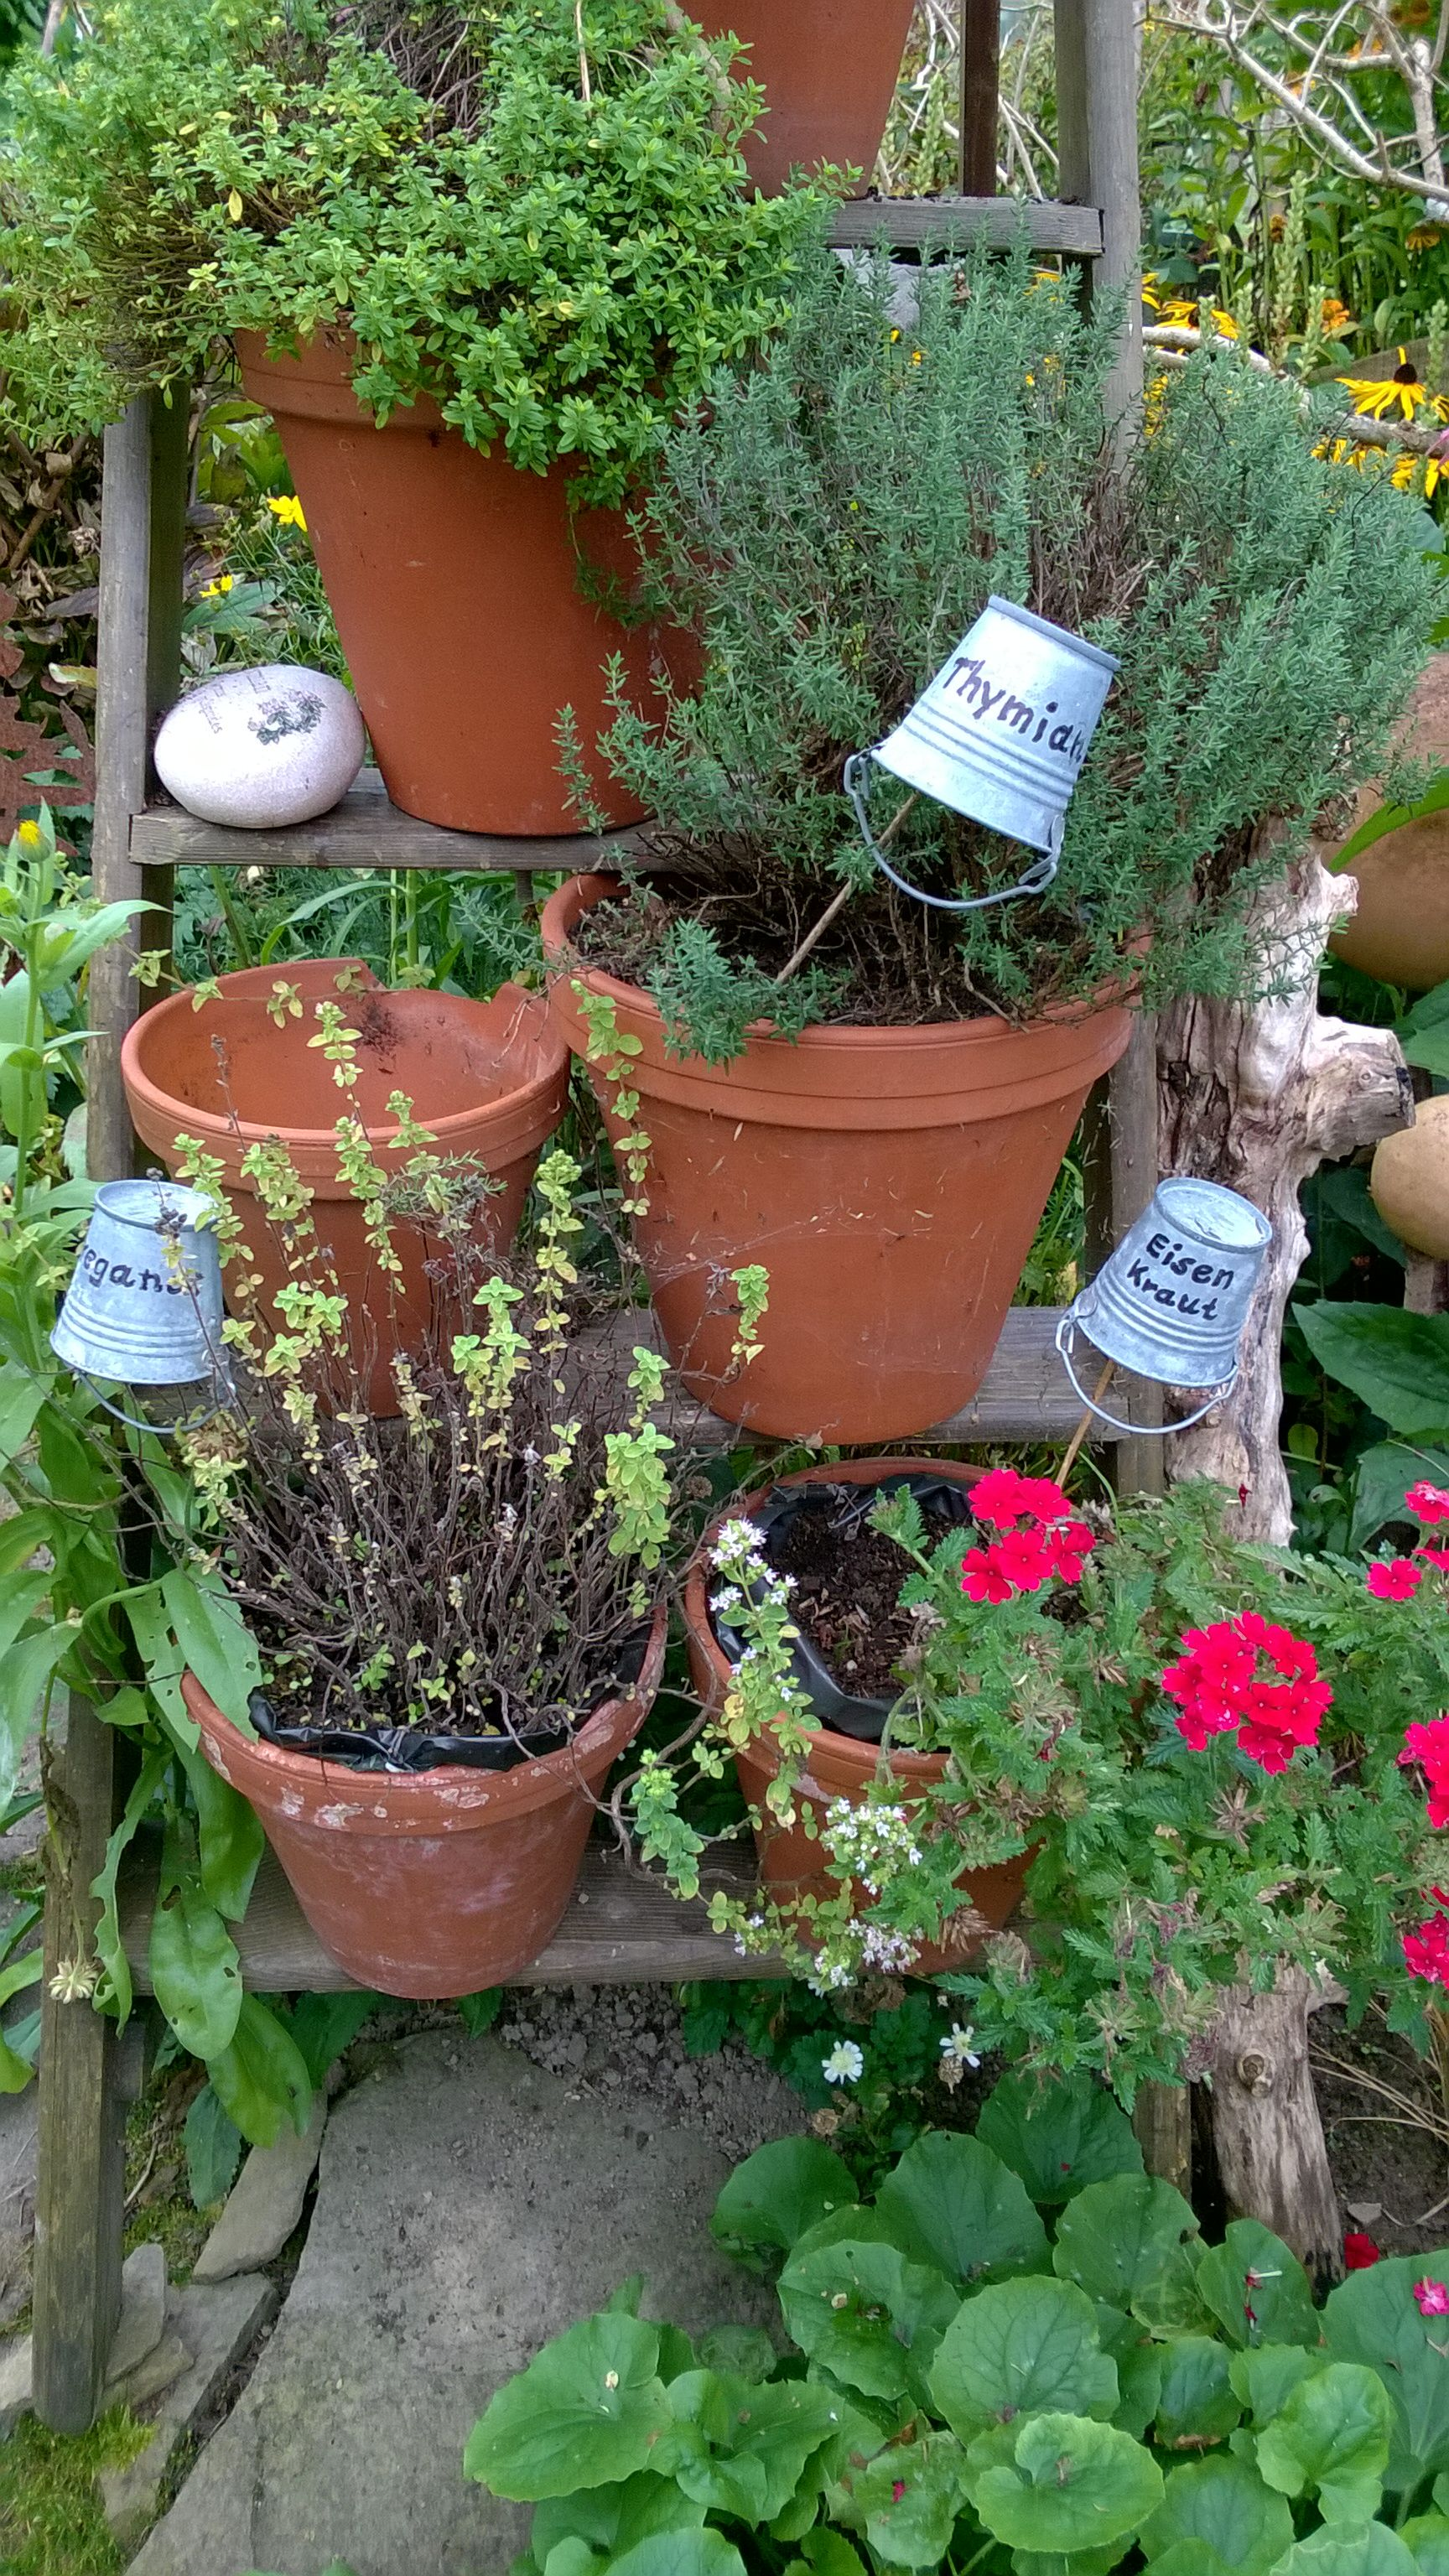 garten t r ume garten t r ume gartendeko garteninspiration garden und plants. Black Bedroom Furniture Sets. Home Design Ideas